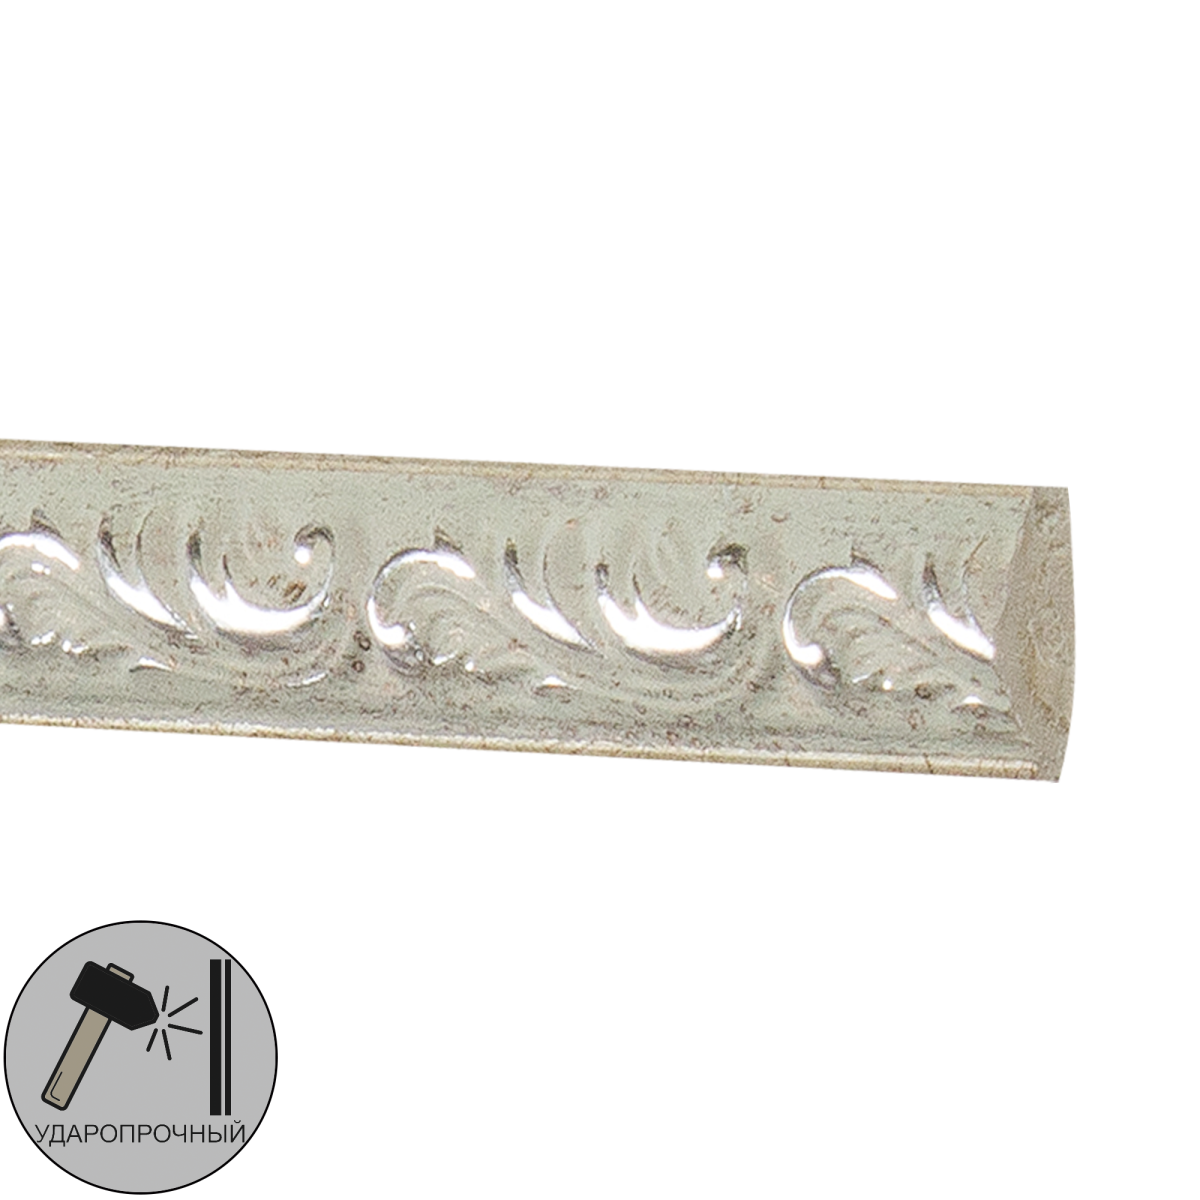 Молдинг настенный полистирол Decomaster 130-59 серебристый 1х1.6х200 см